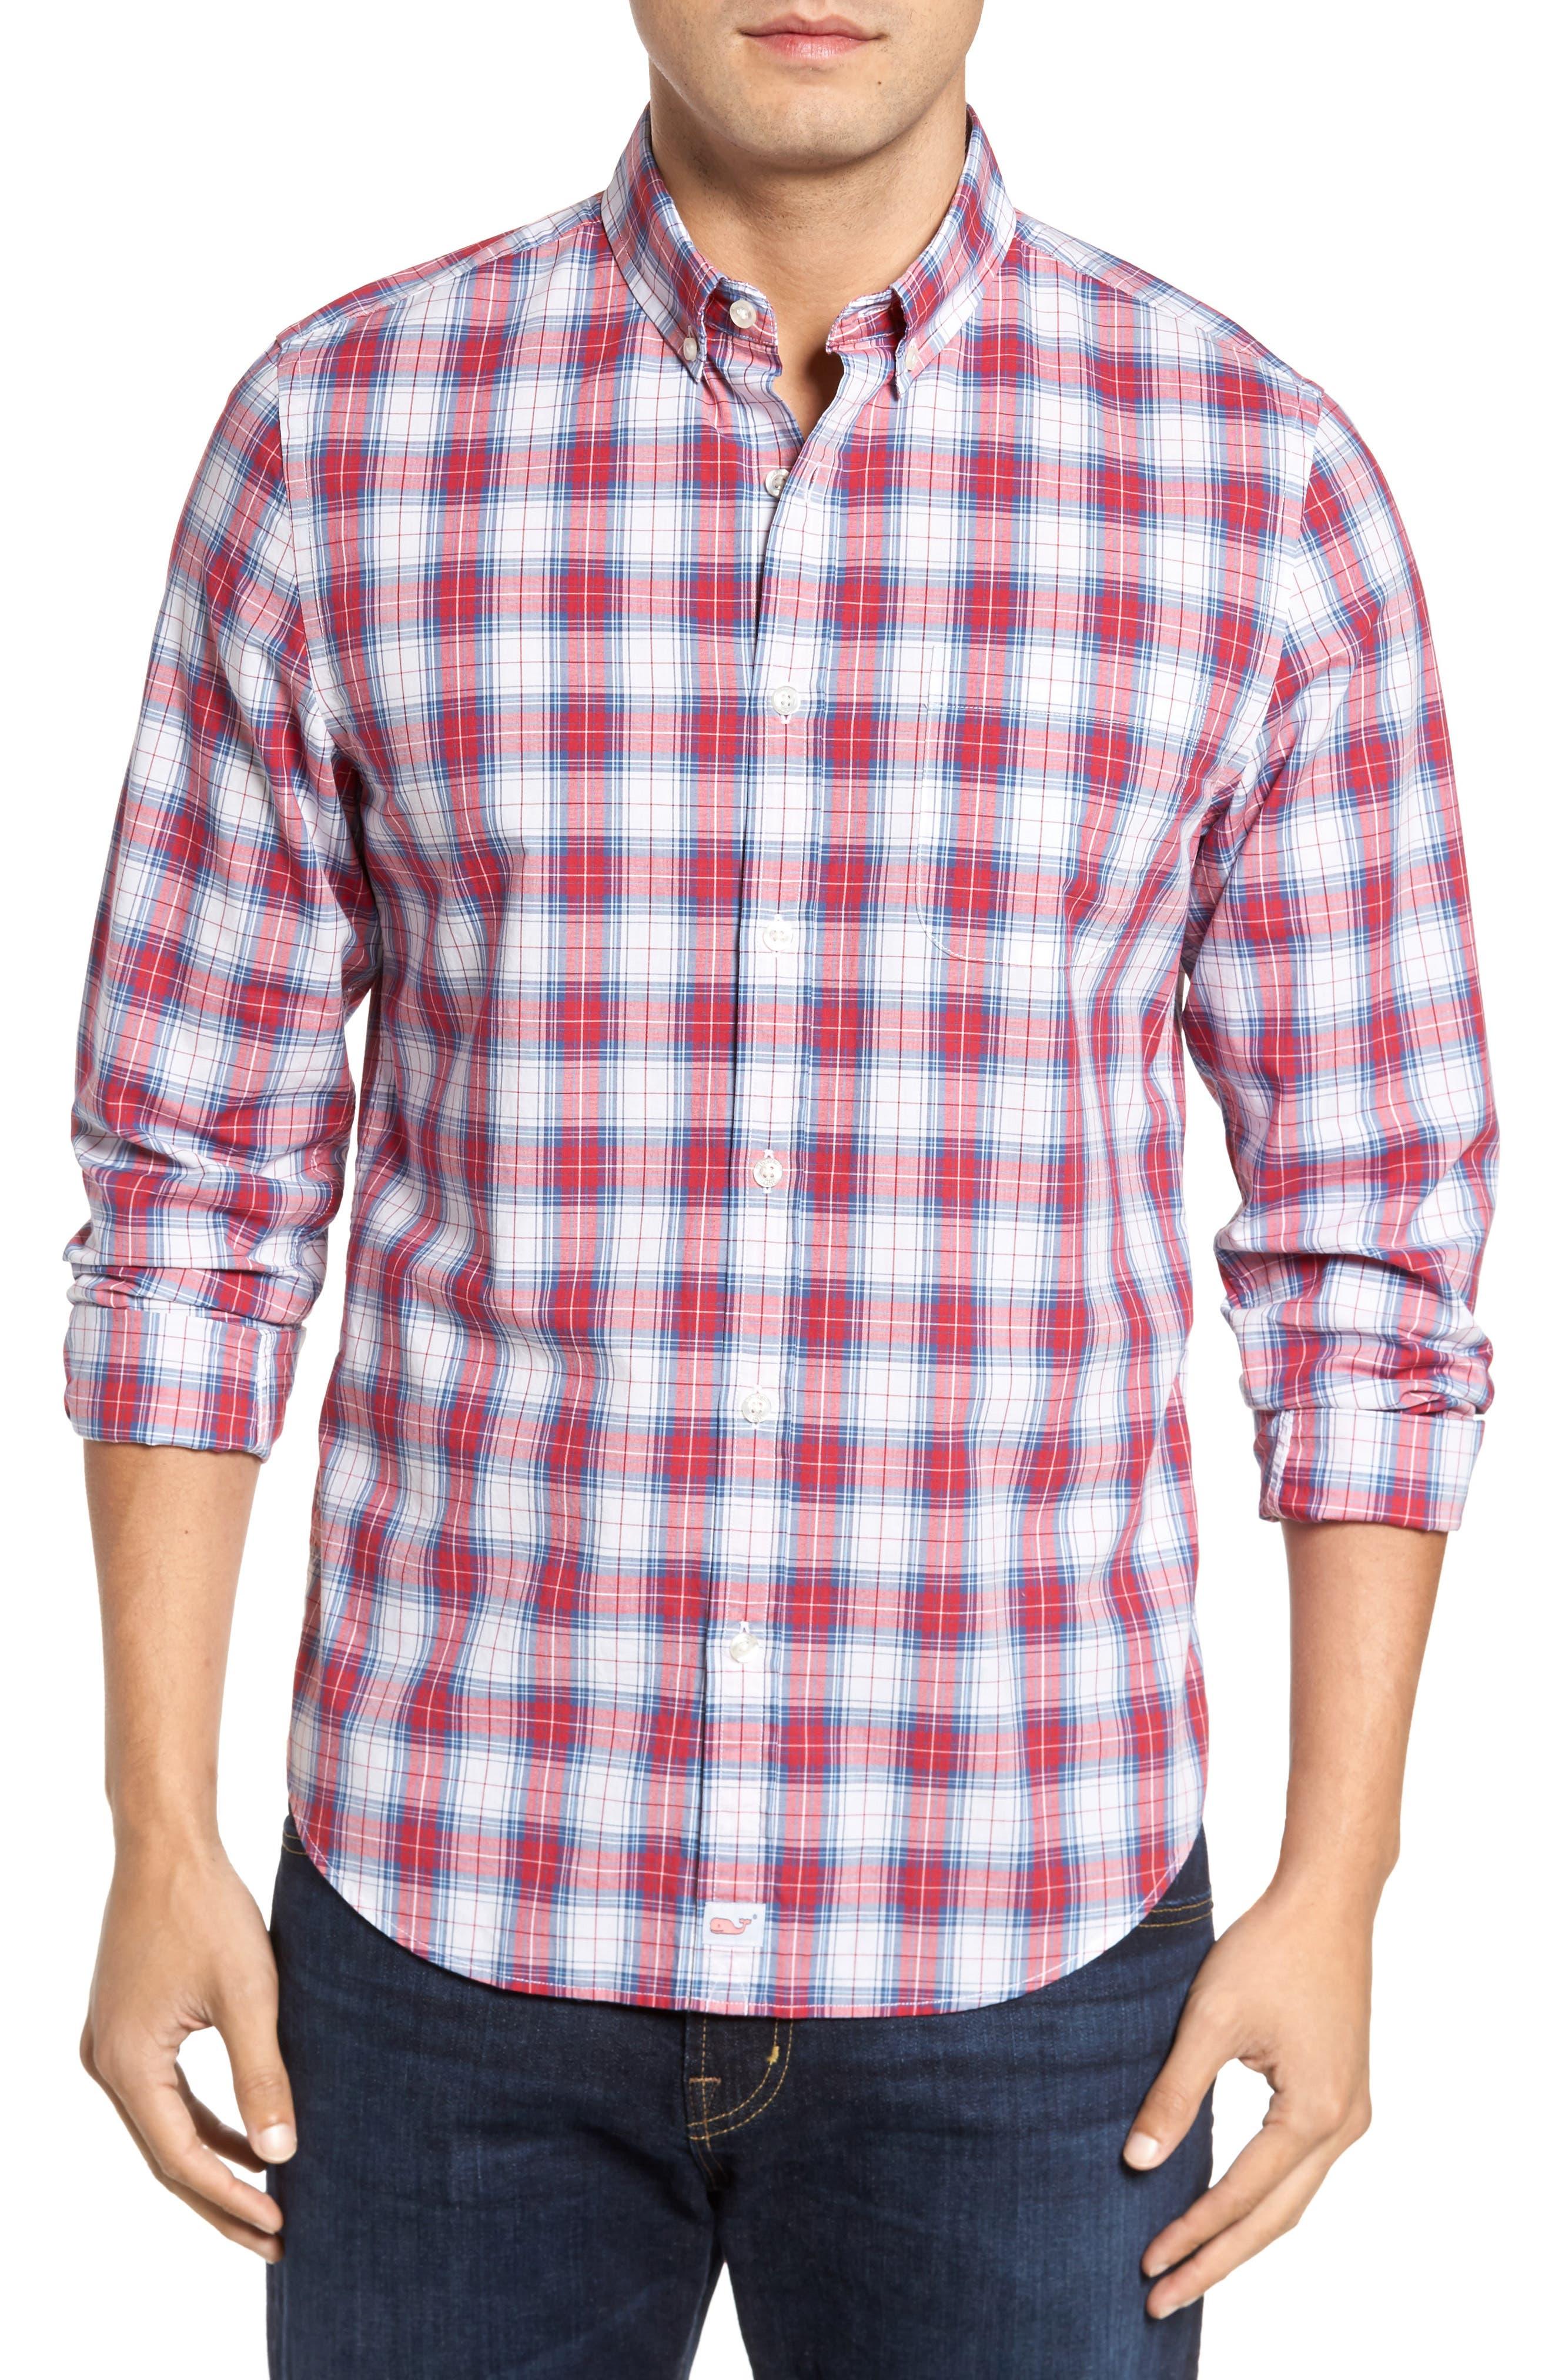 Alternate Image 1 Selected - vineyard vines Murray Bucklin Point Slim Fit Plaid Sport Shirt